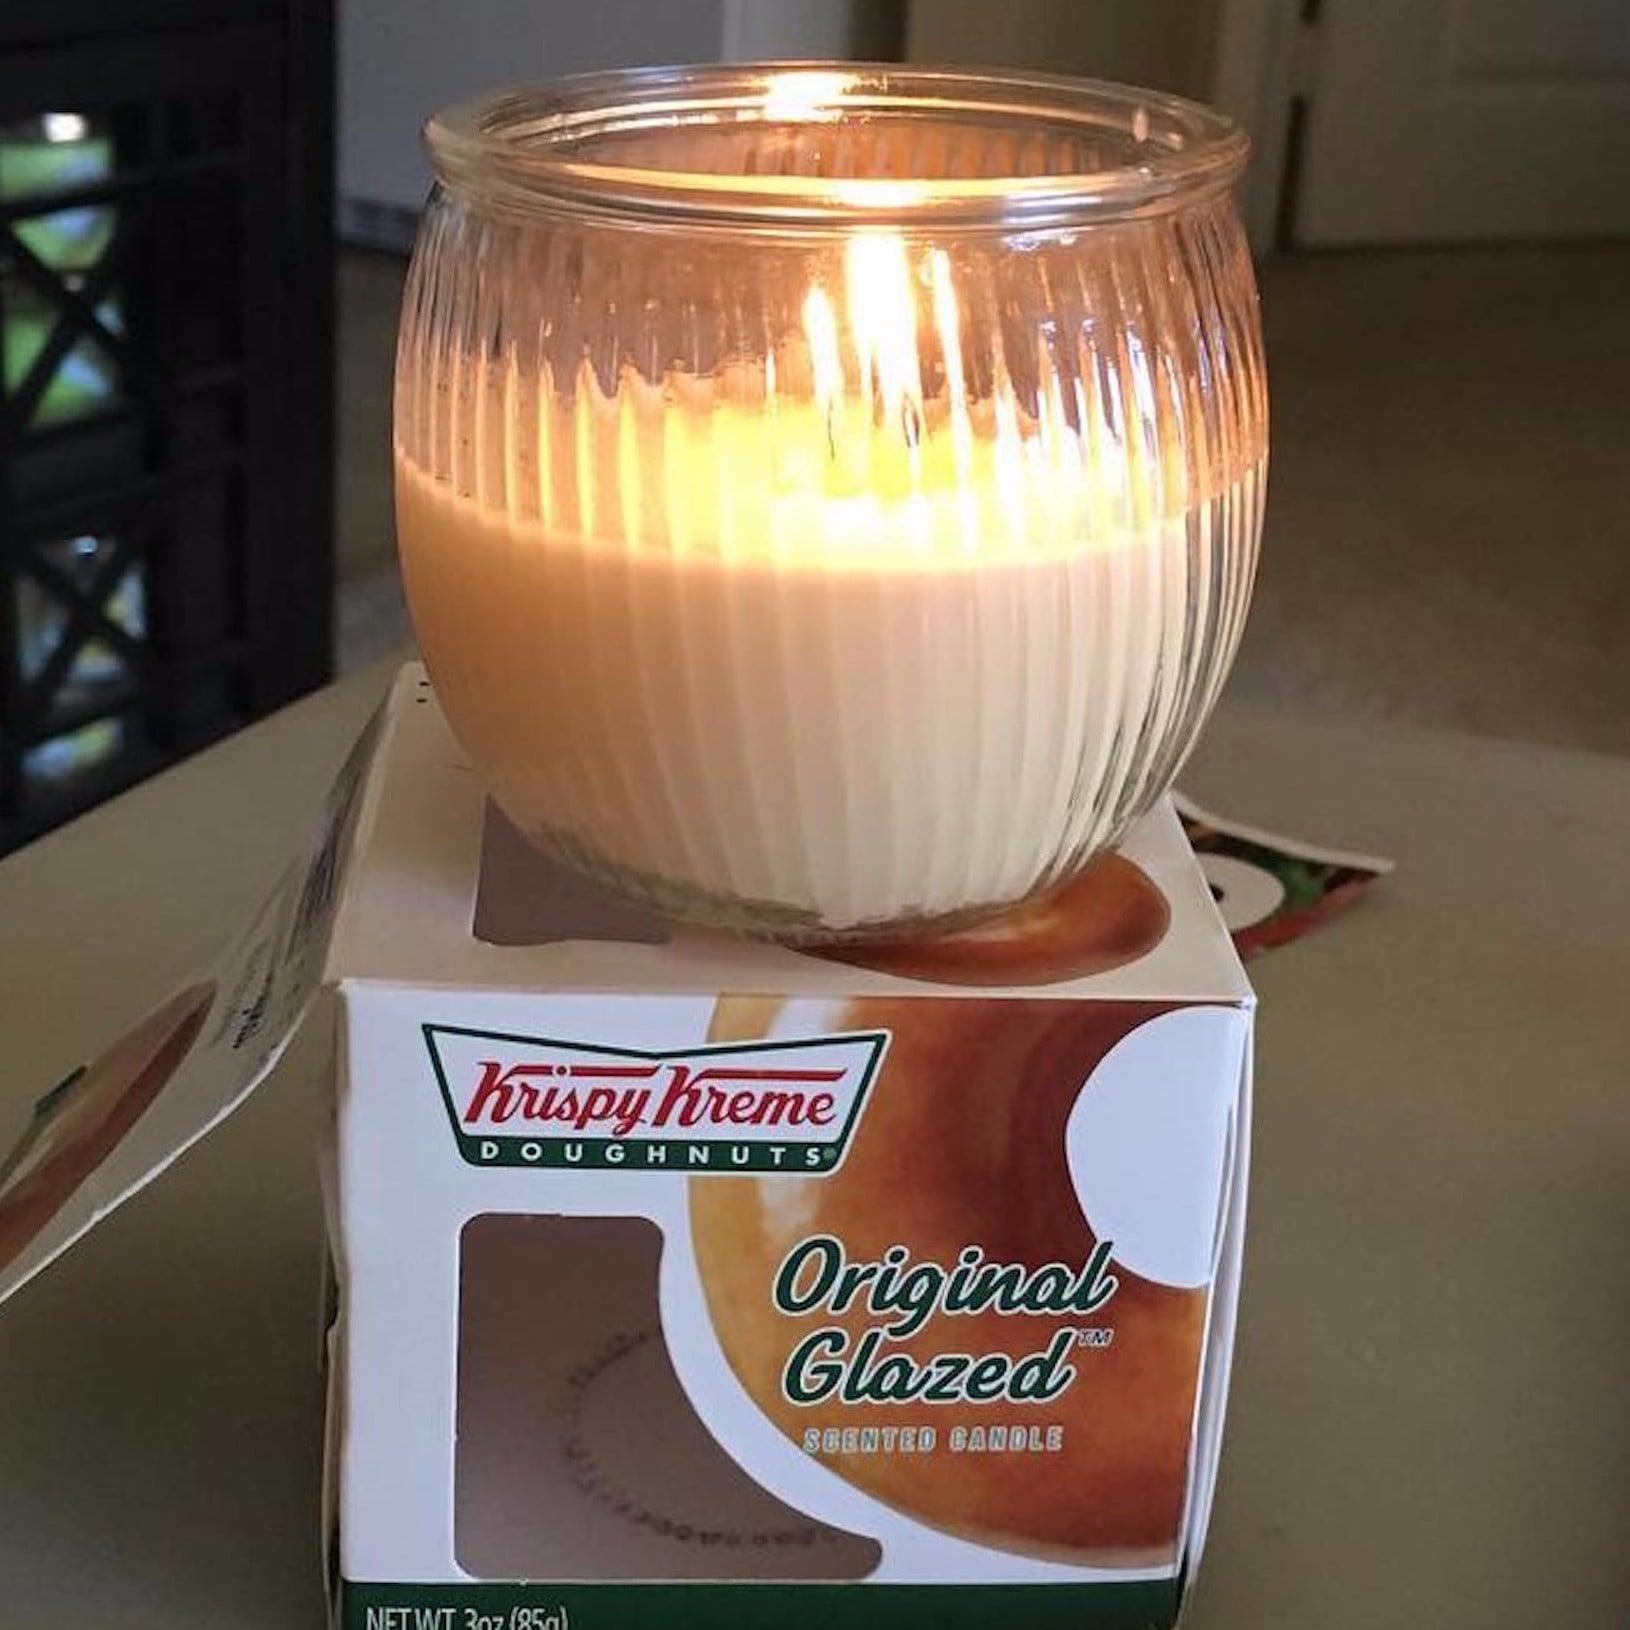 Krispy Kreme Candles | POPSUGAR Home